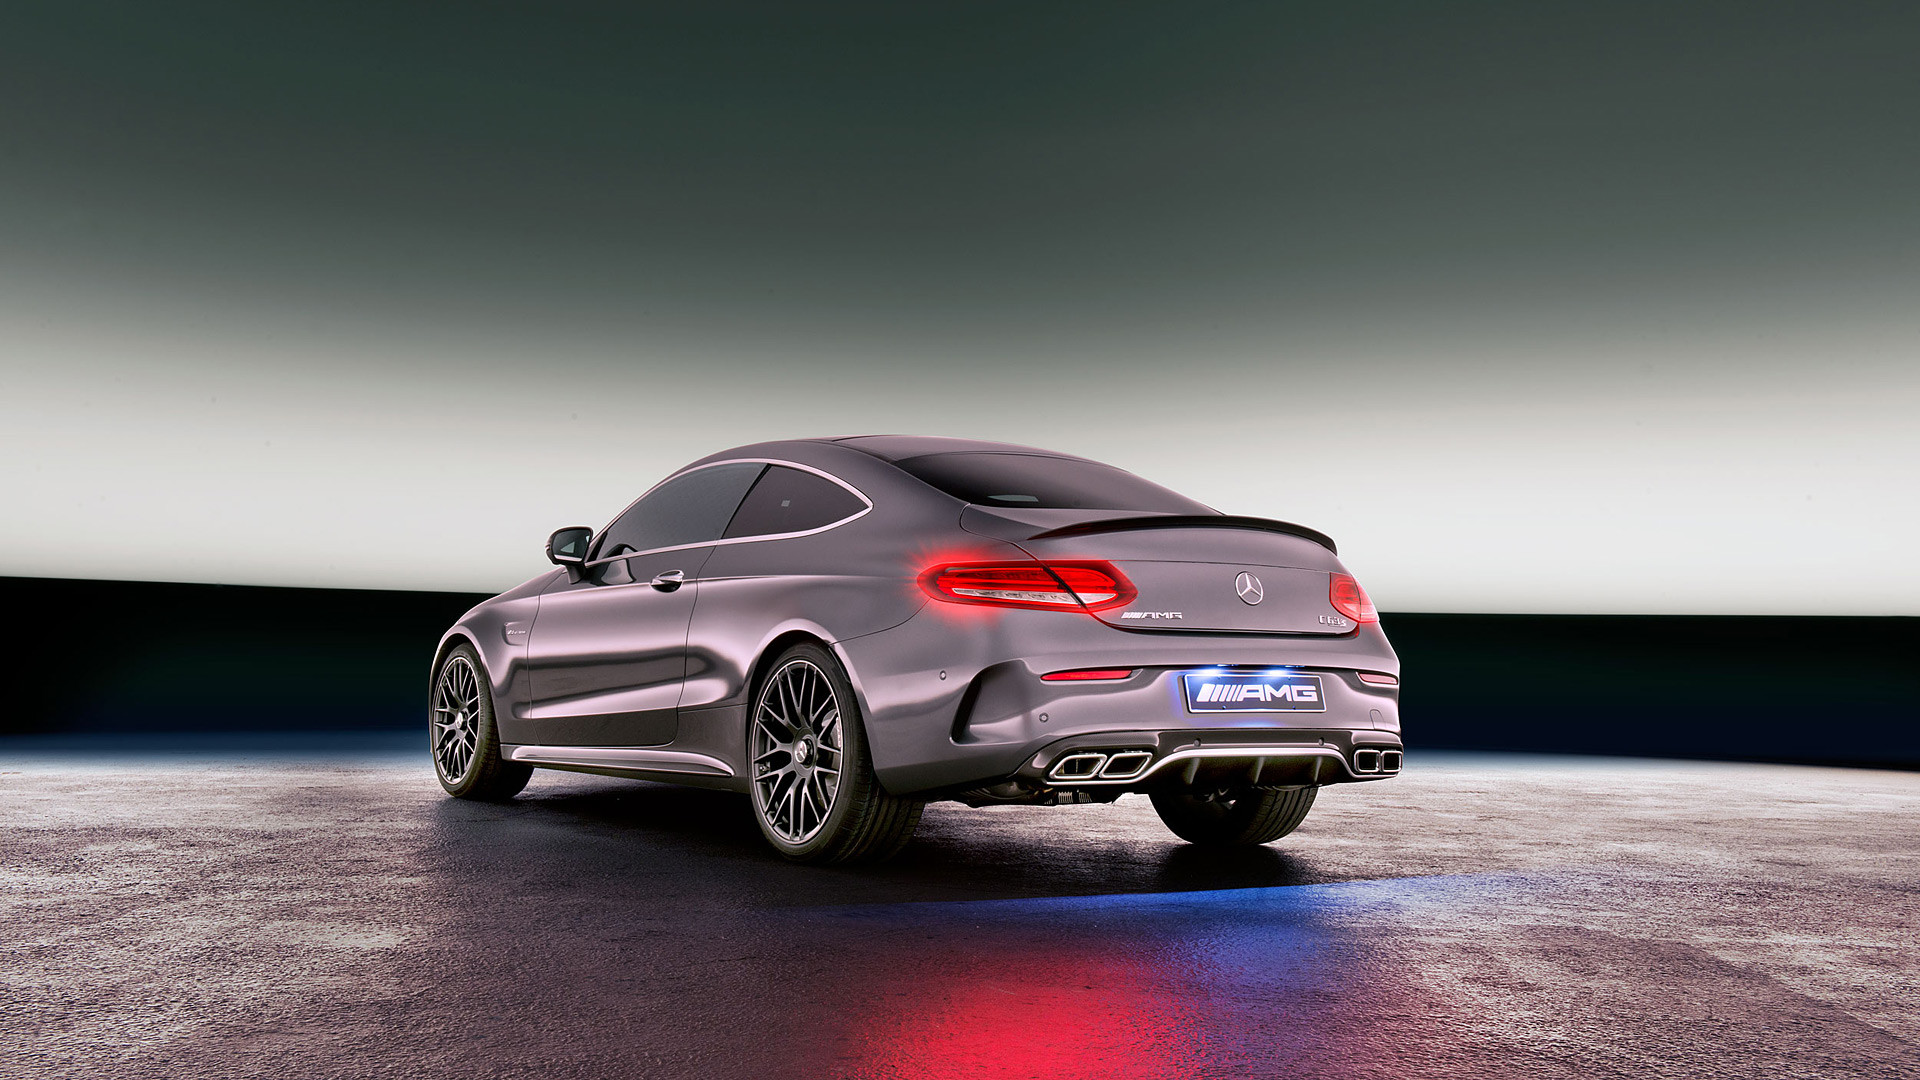 Mercedes benz amg wallpaper for Mobile mercedes benz